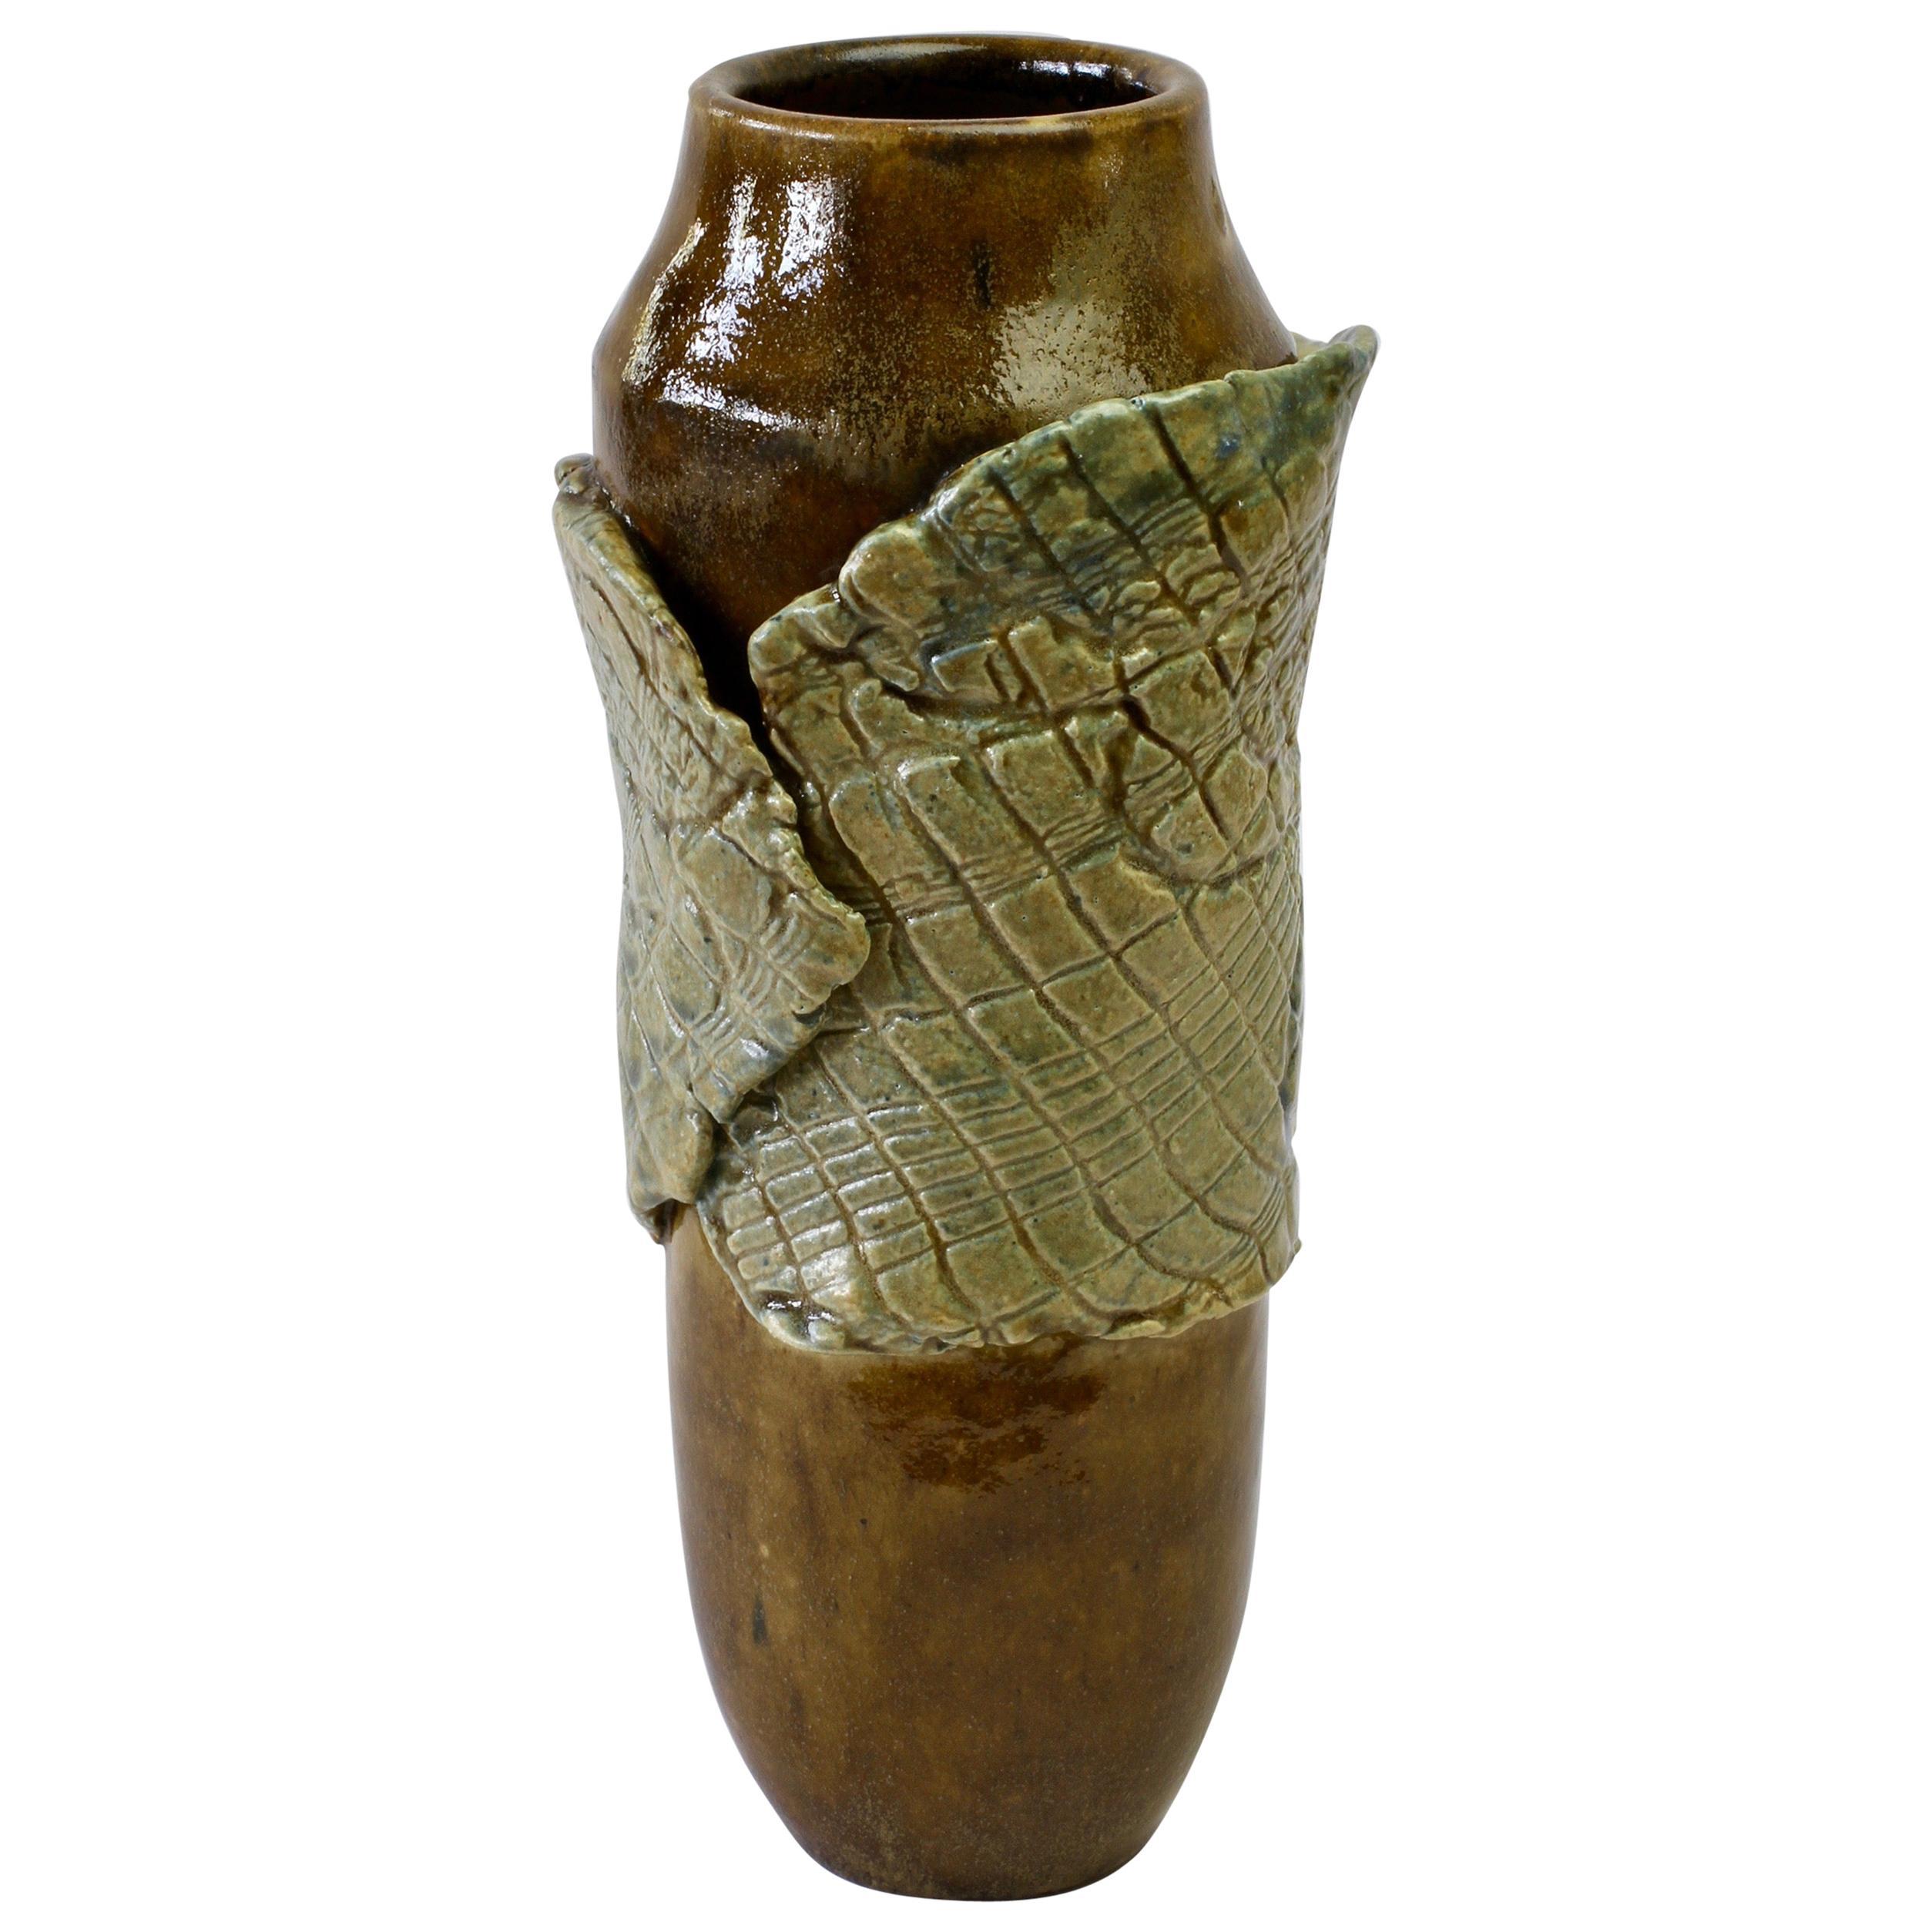 Signe Pistorious-Lehmann Organic German Art Studio Pottery Vase, circa 1980s